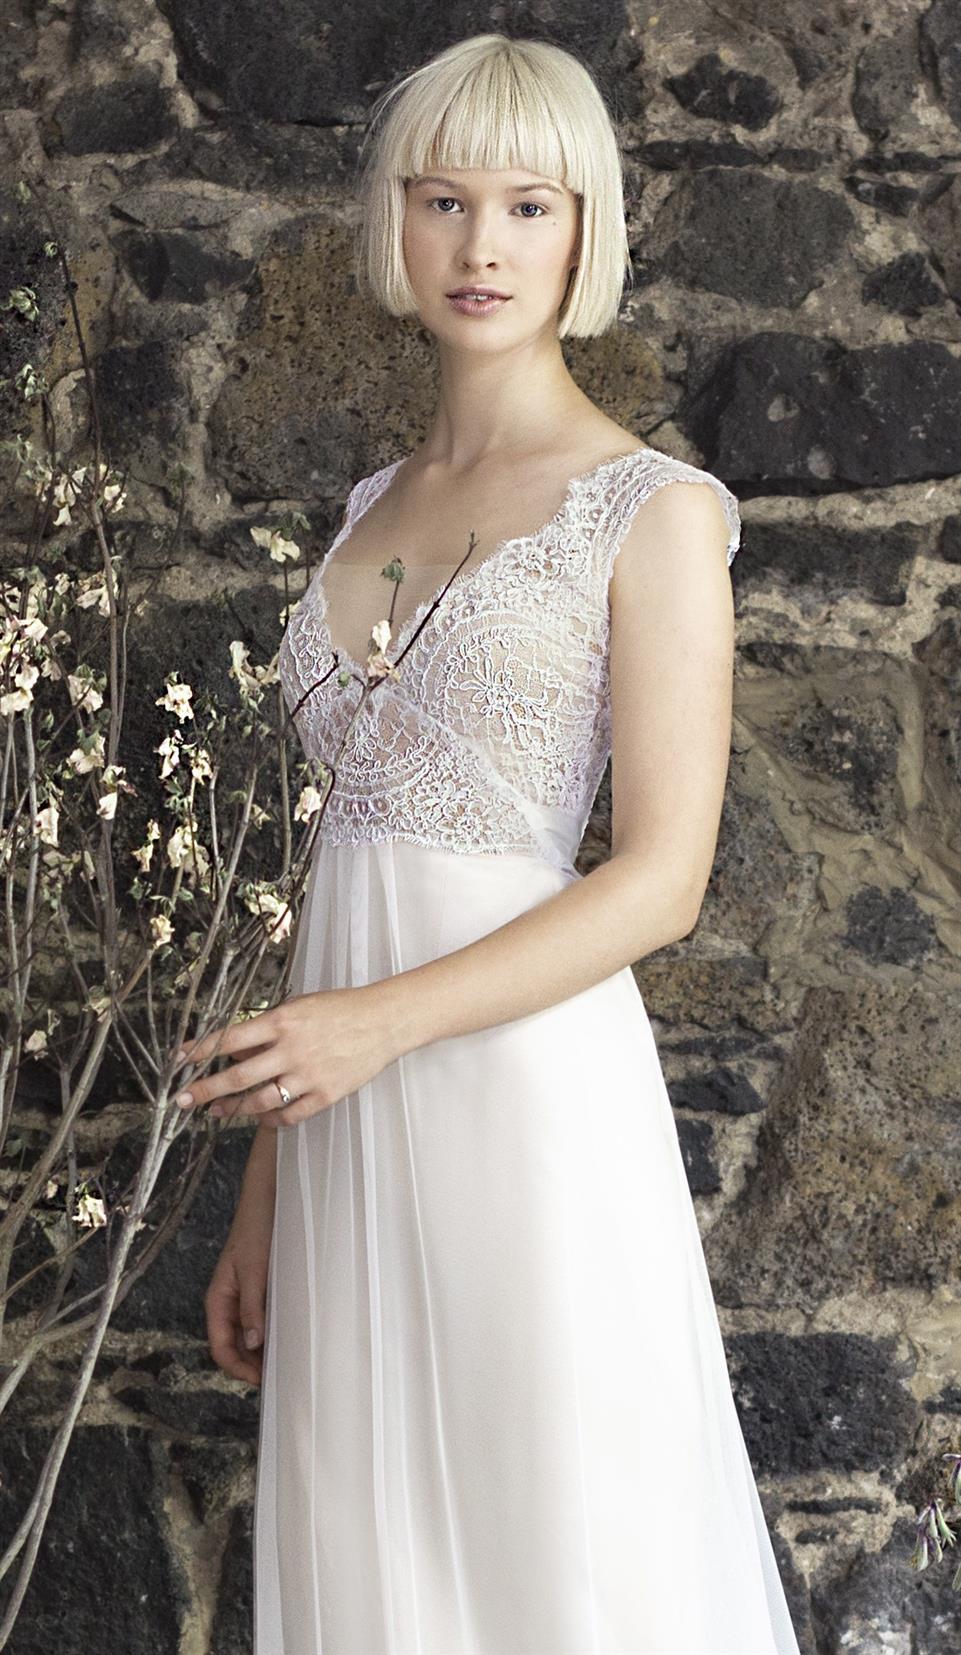 Gwendolynne White - Arielle Wedding Dress